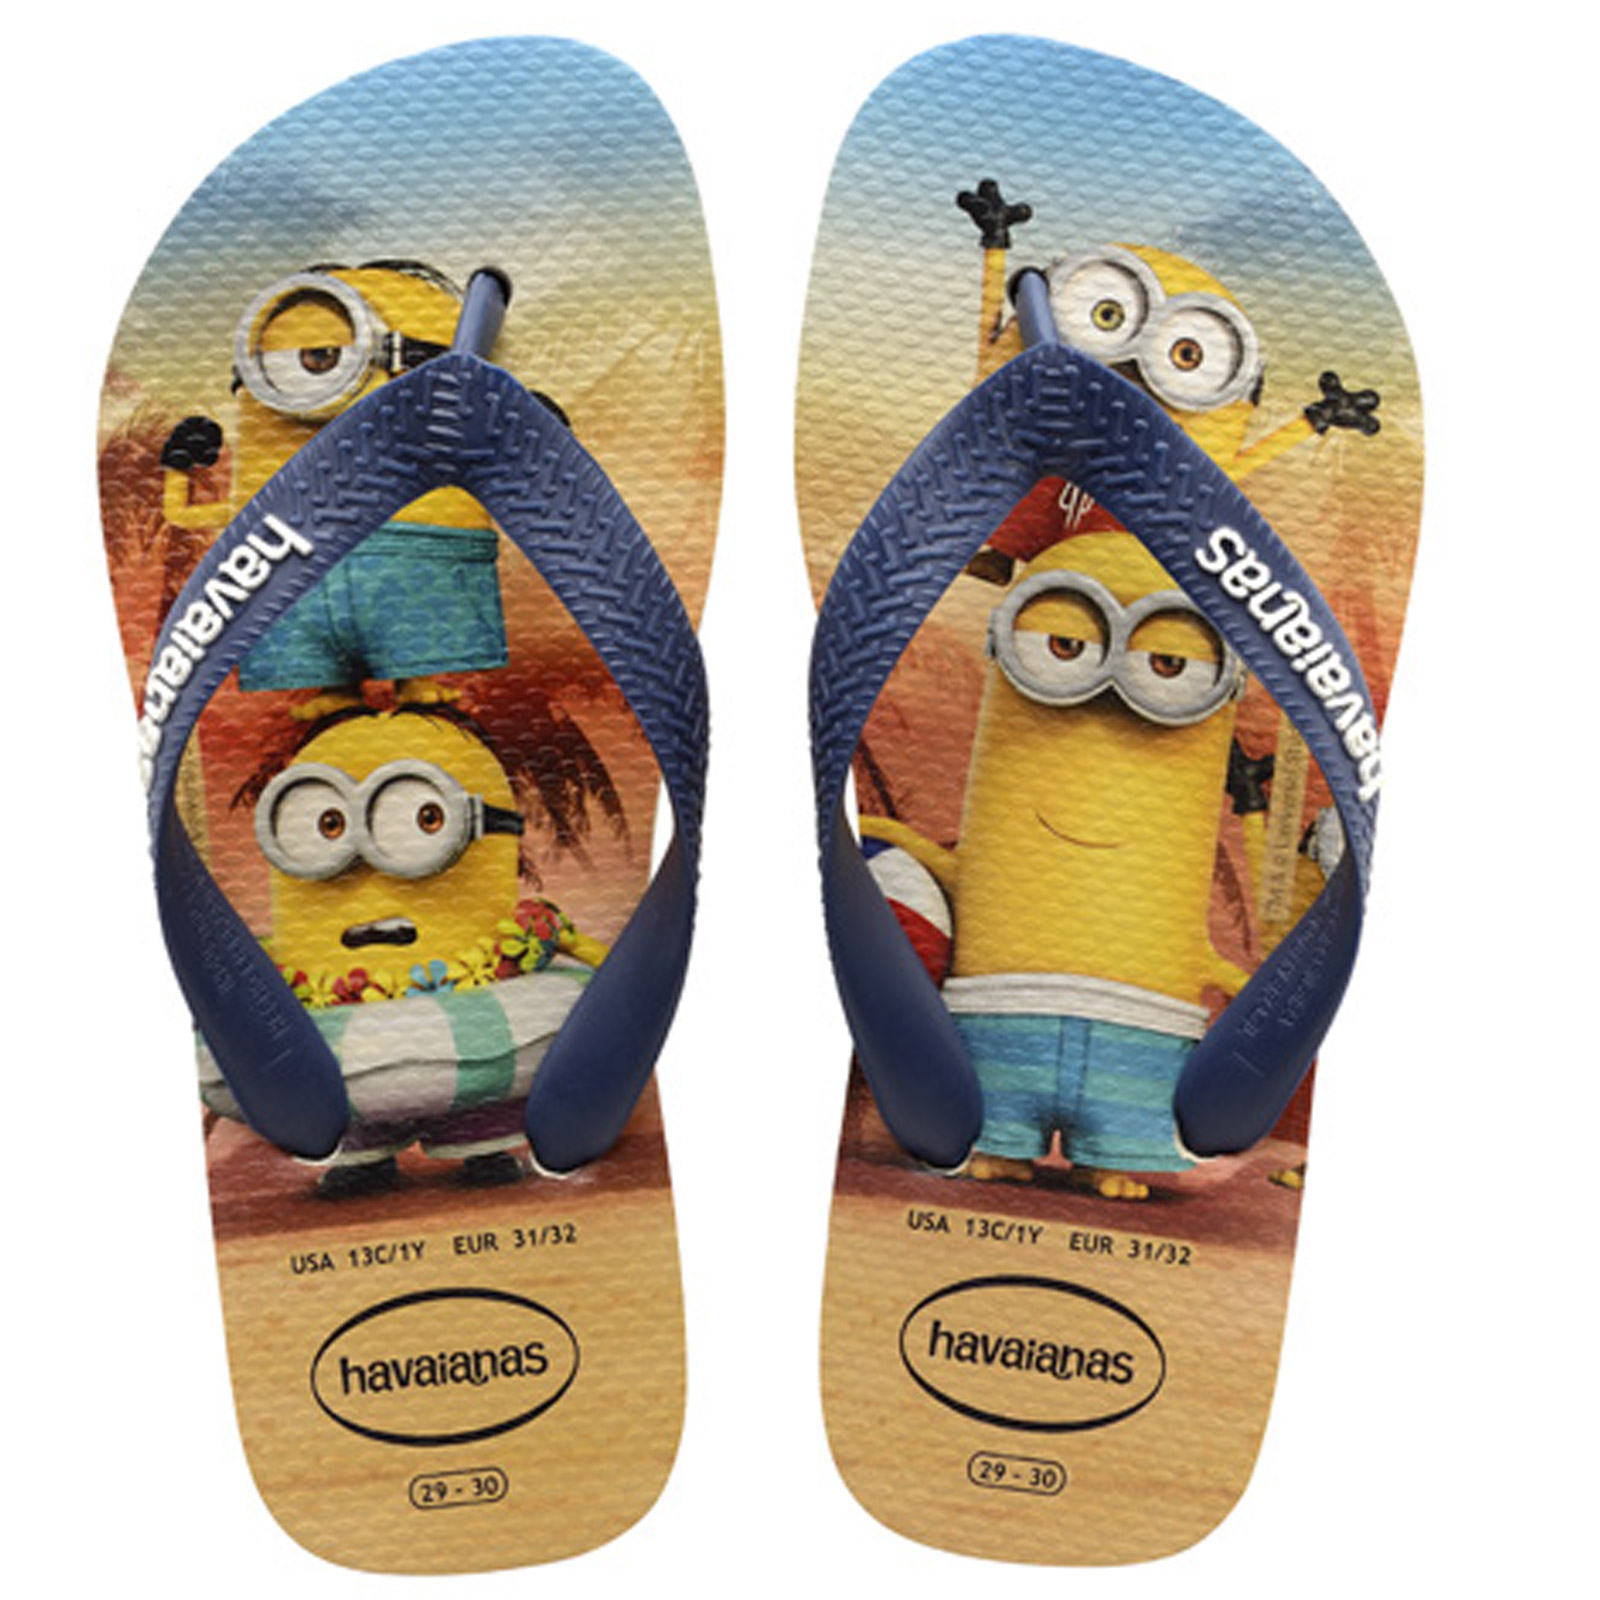 Minion Shoes For Sale Uk